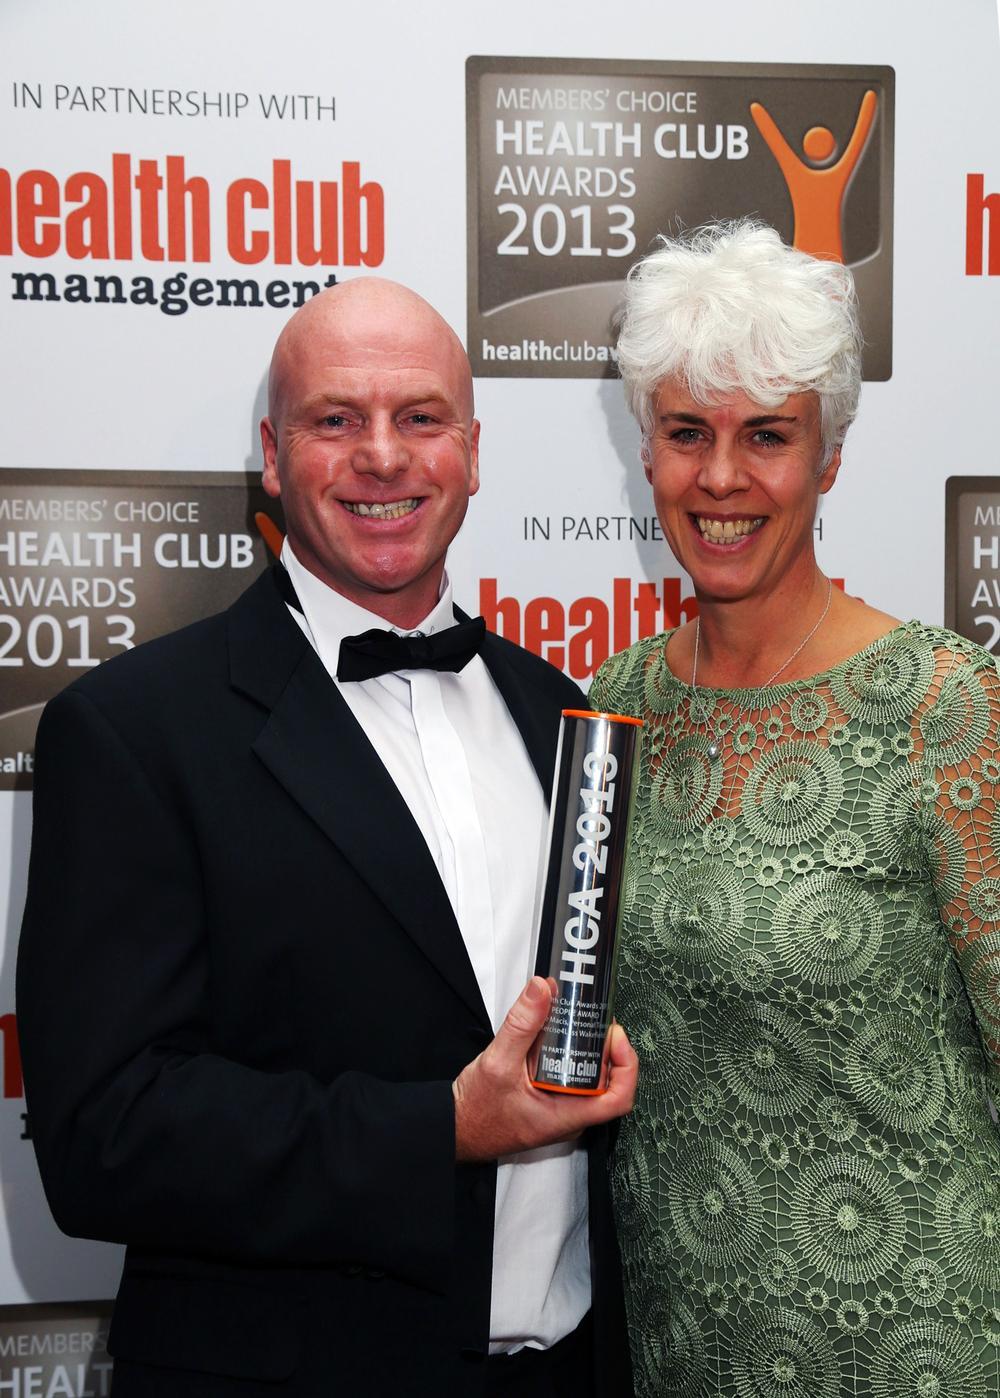 Liz Terry with People Award winner Steve Macis